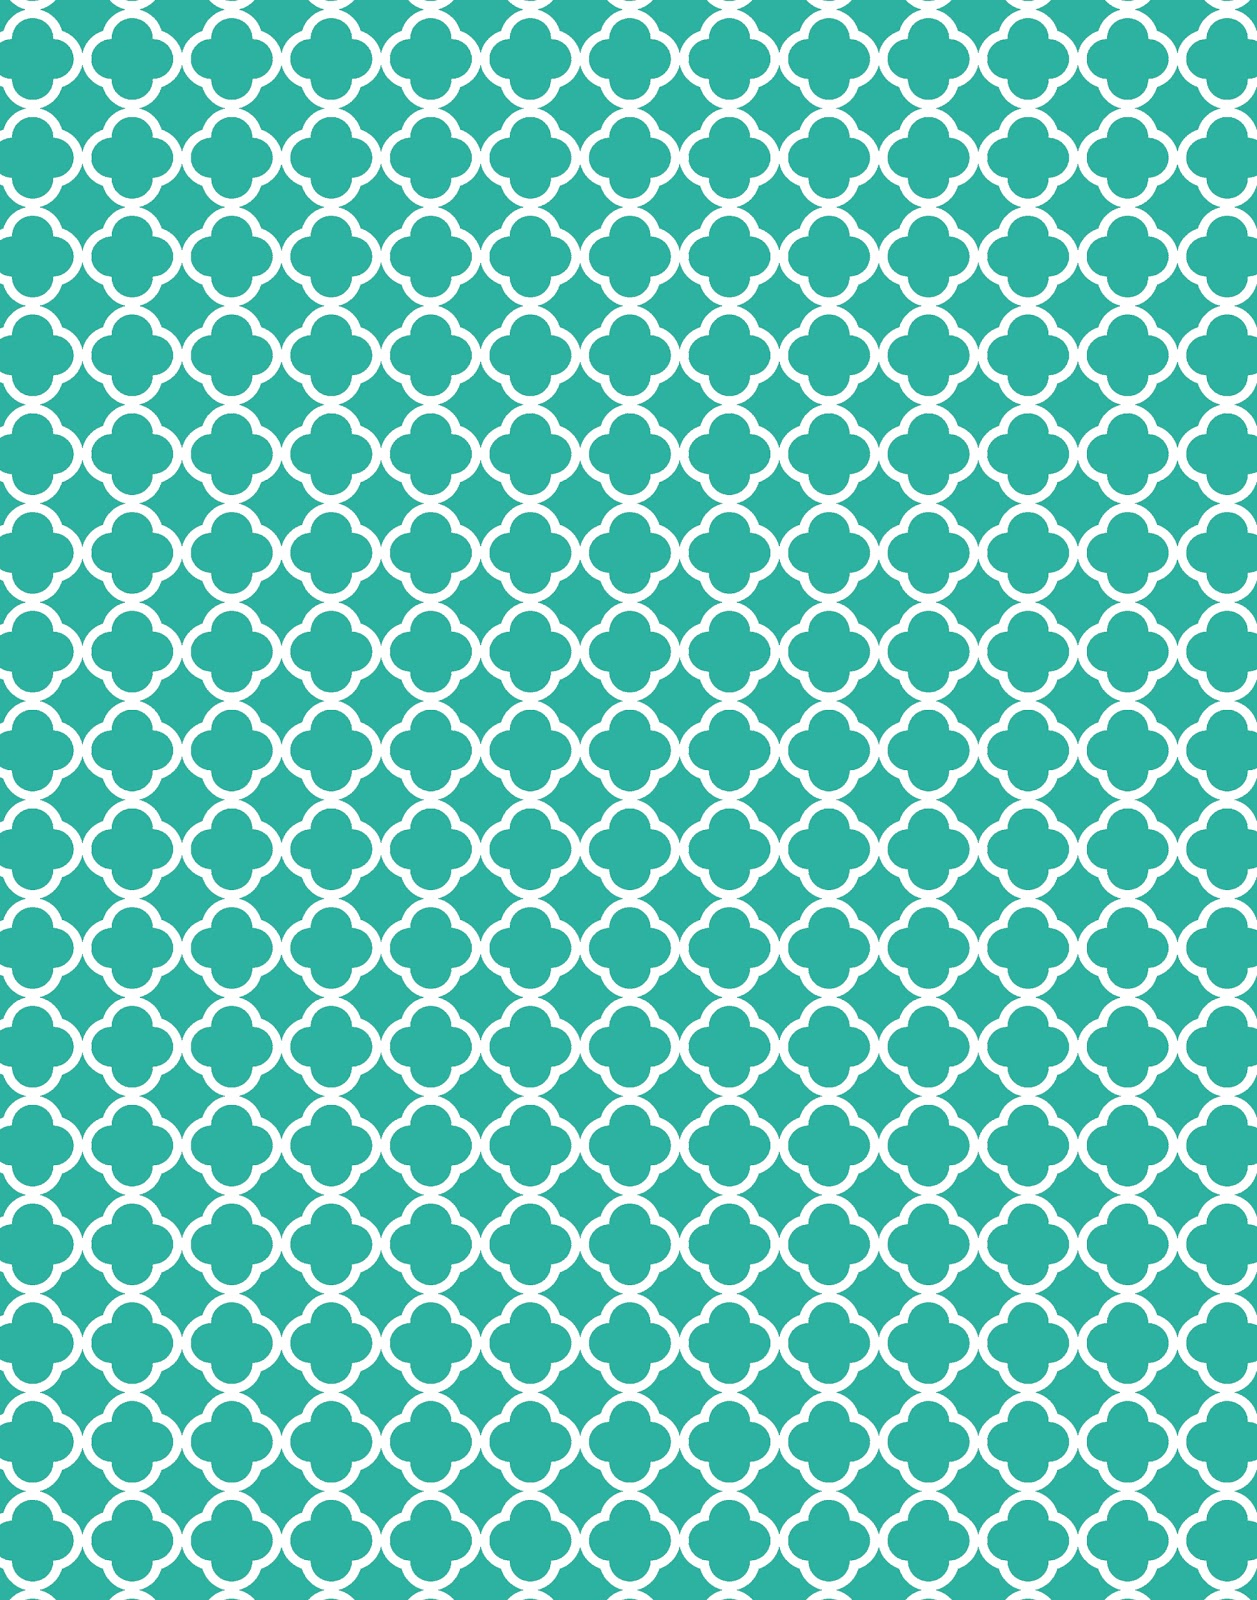 quatrefoil pattern background - photo #5